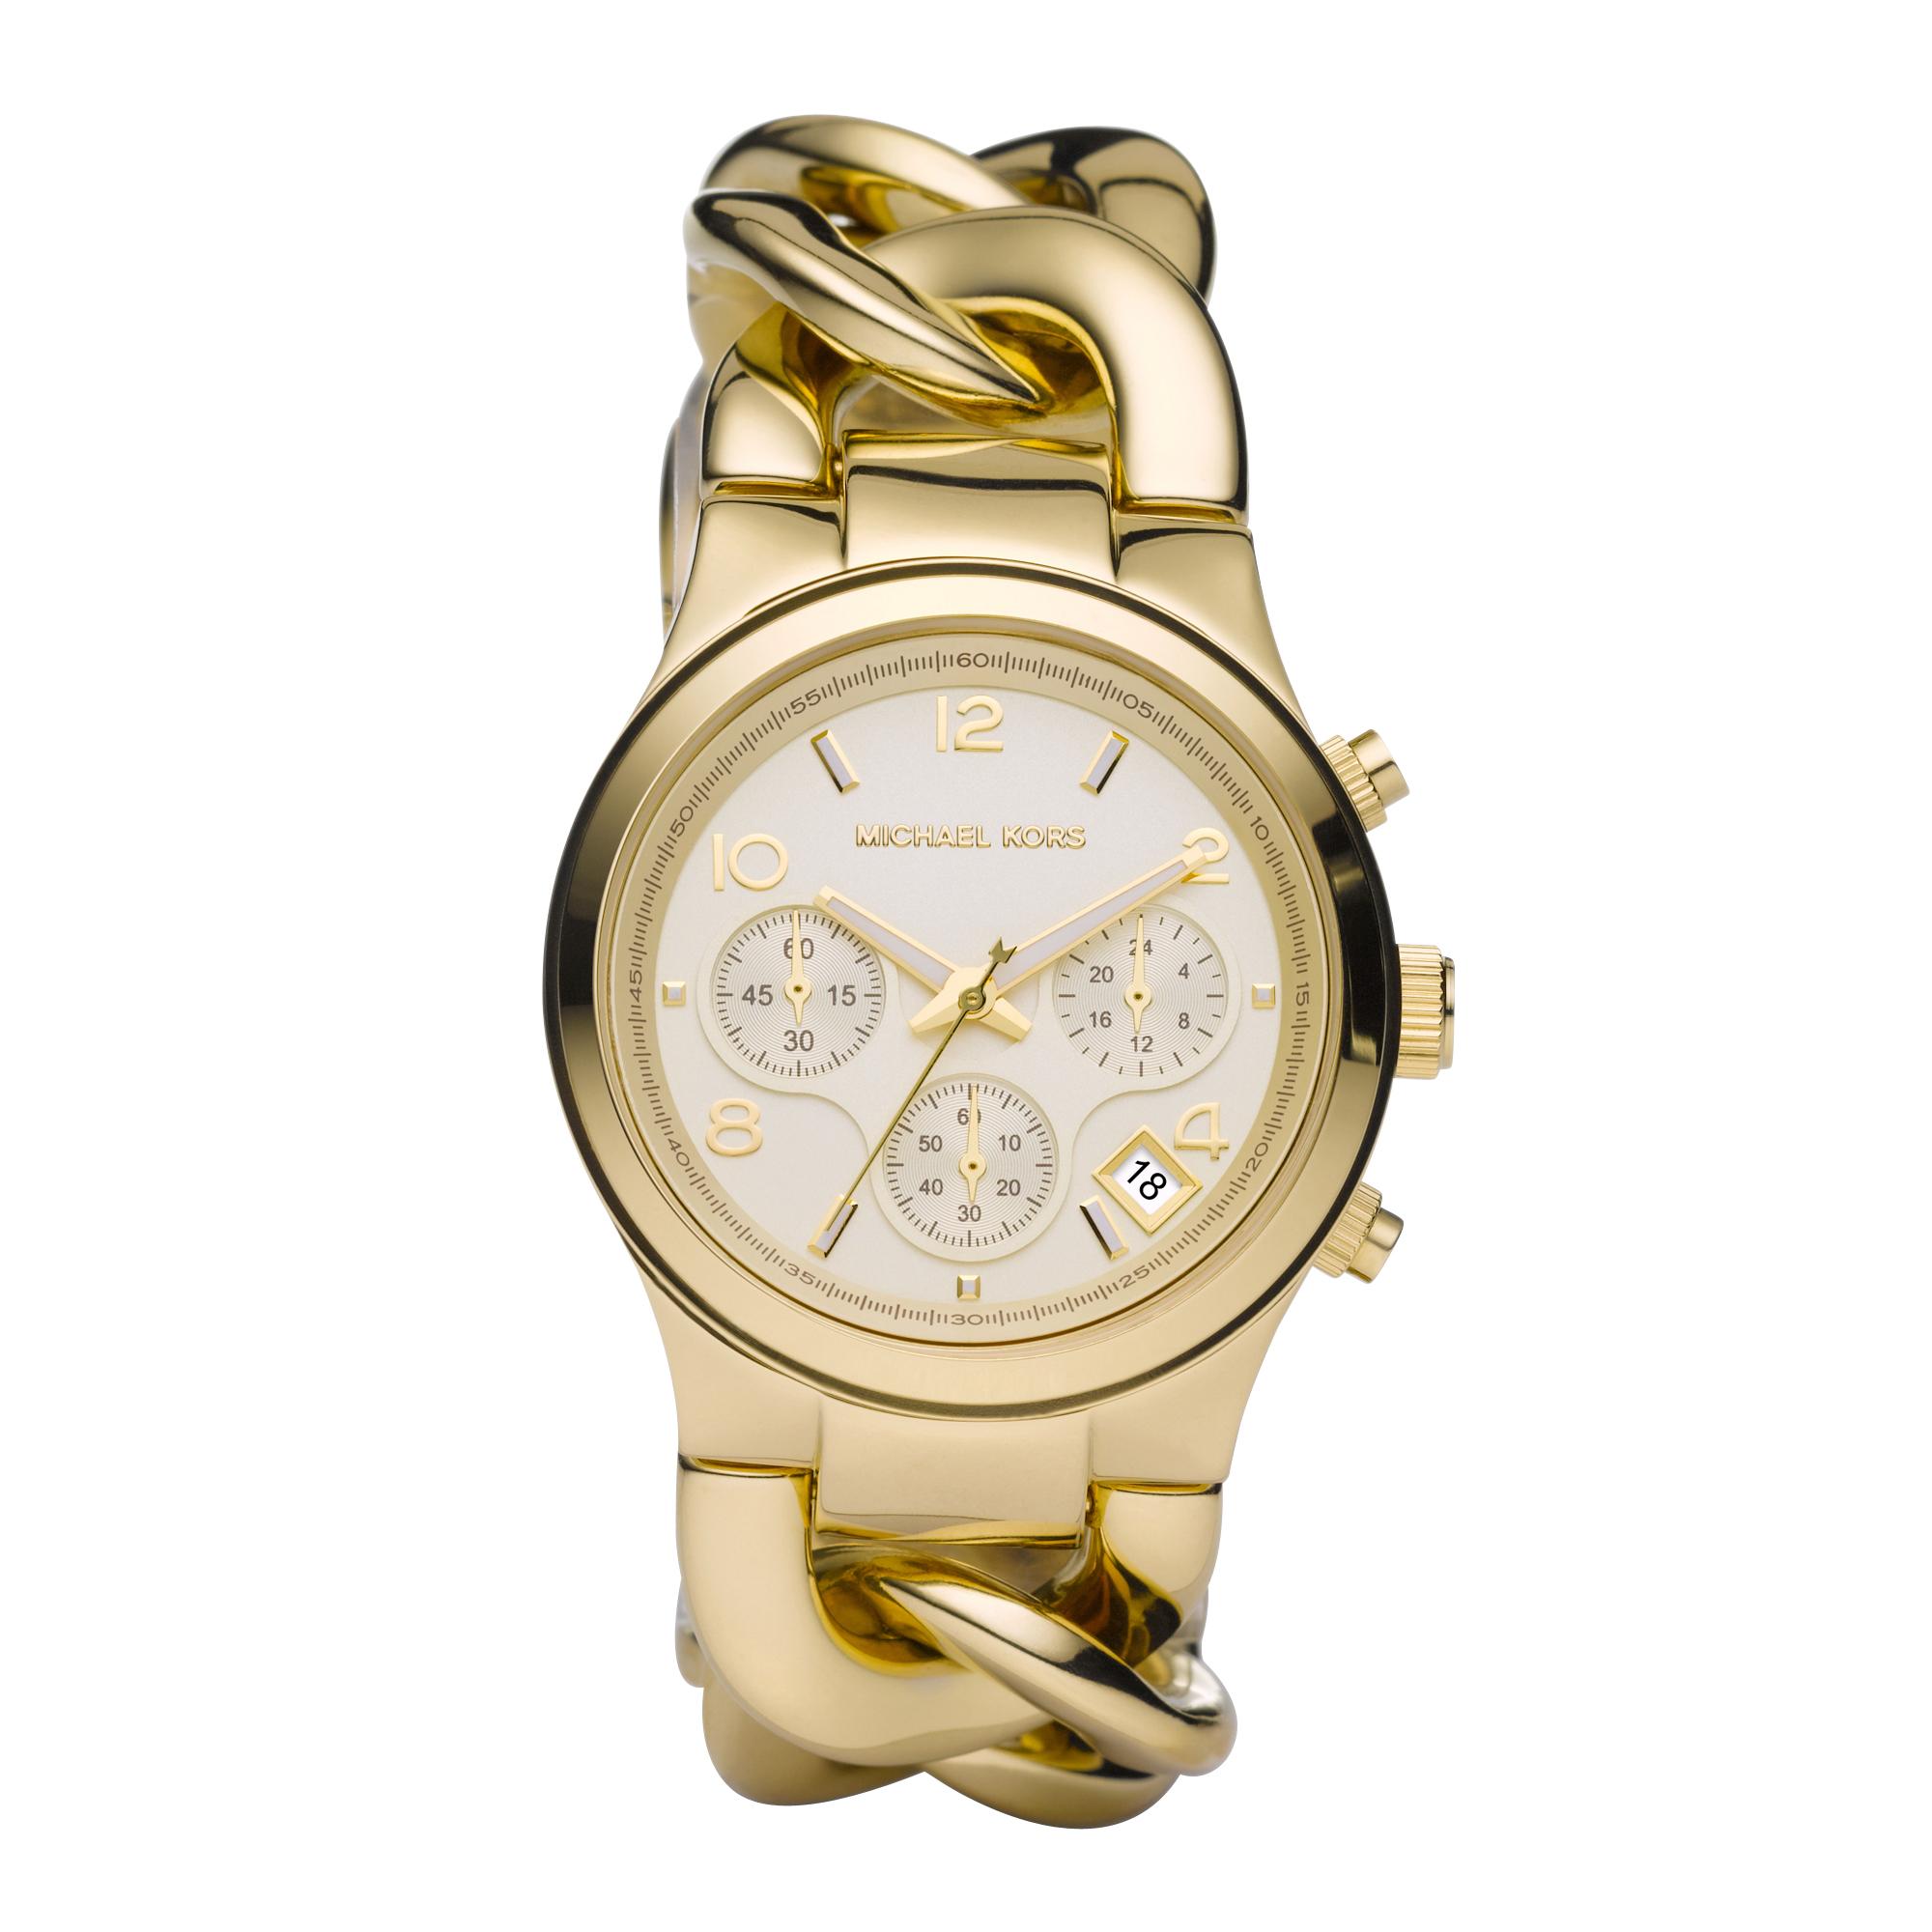 Reloj pulsera, Michael Kors.